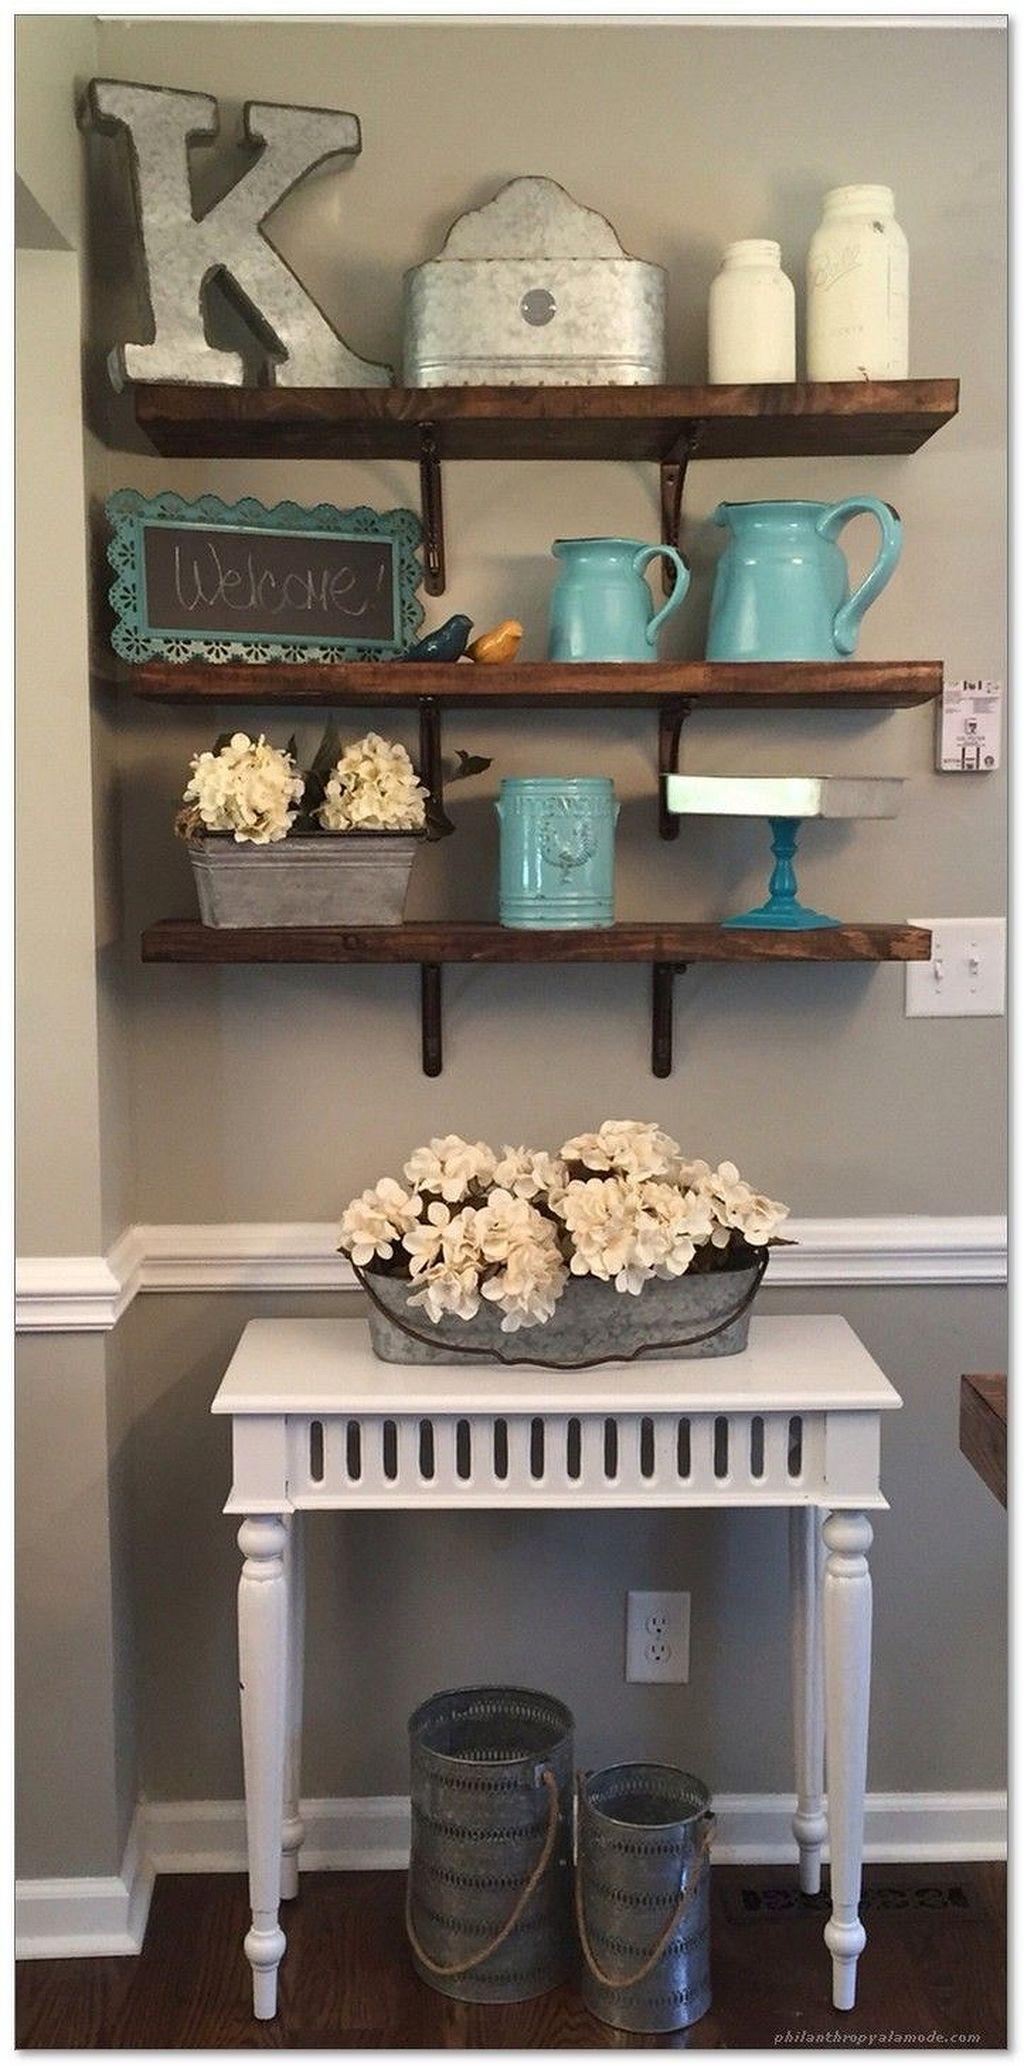 15 DIY Farmhouse Living Room Wall Decor And Design Inspiration | Pinterest  | Farmhouse Living Rooms, Room Wall Decor And Decoration